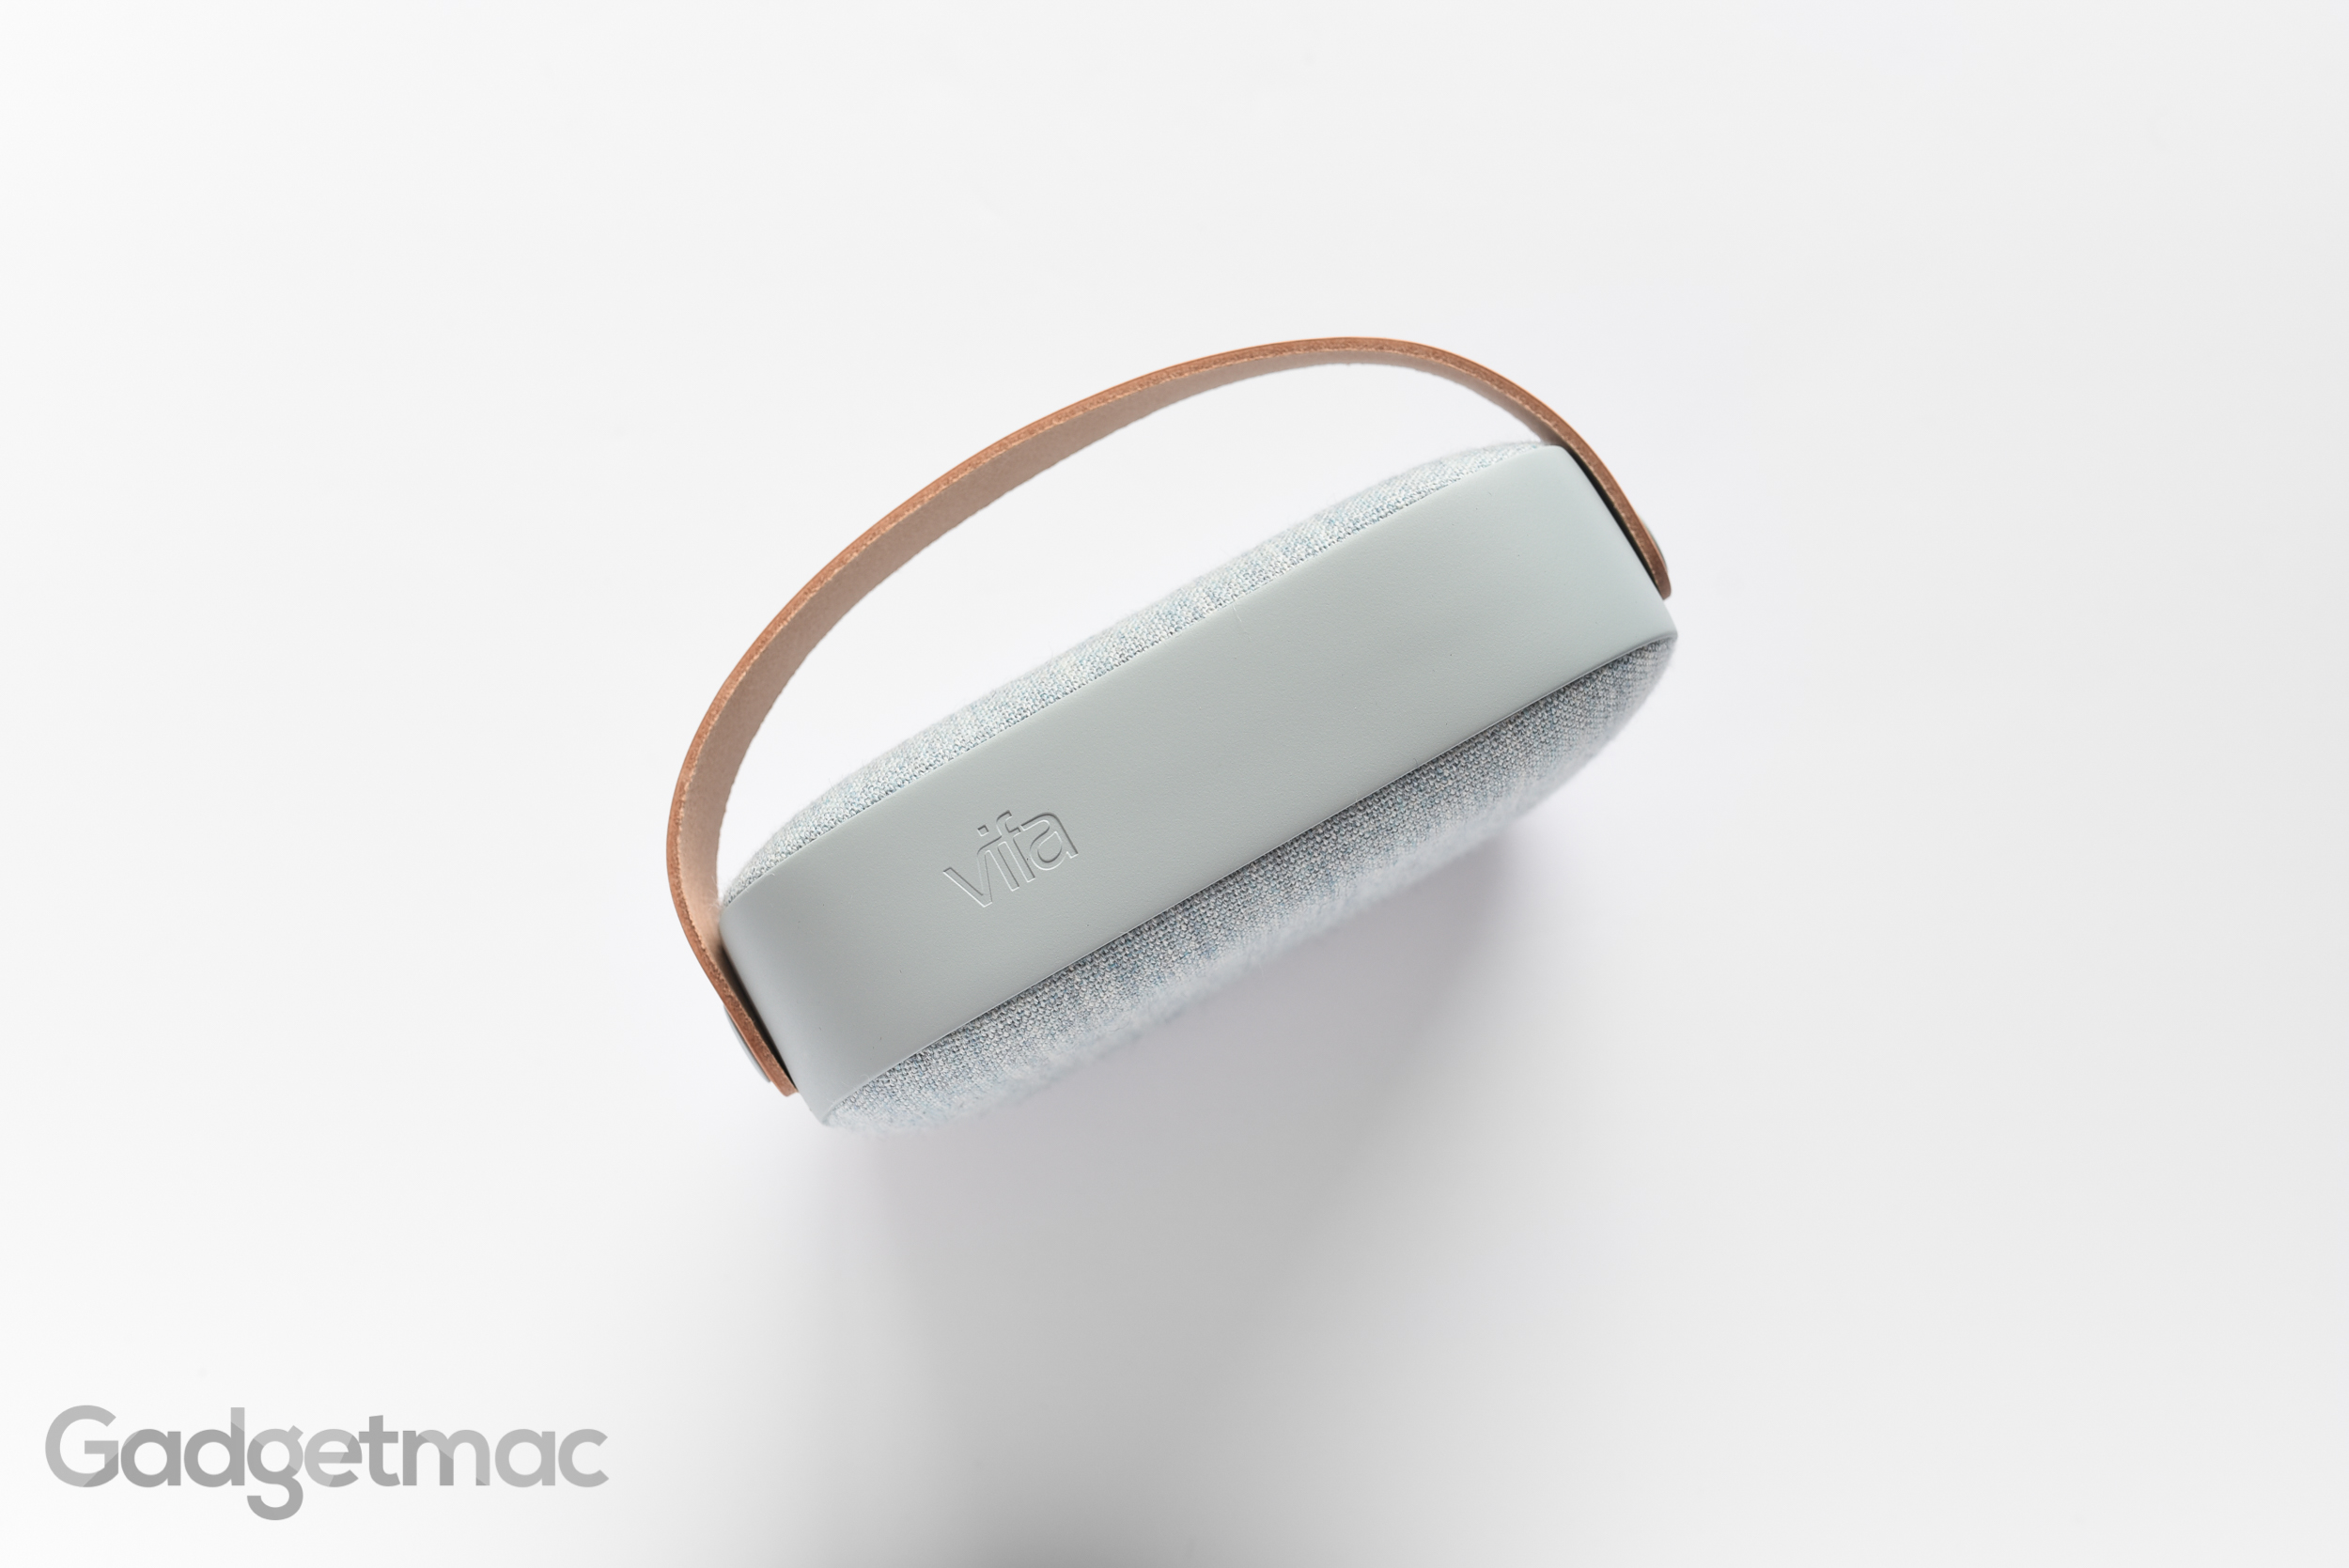 vifa-portable-wireless-speaker.jpg